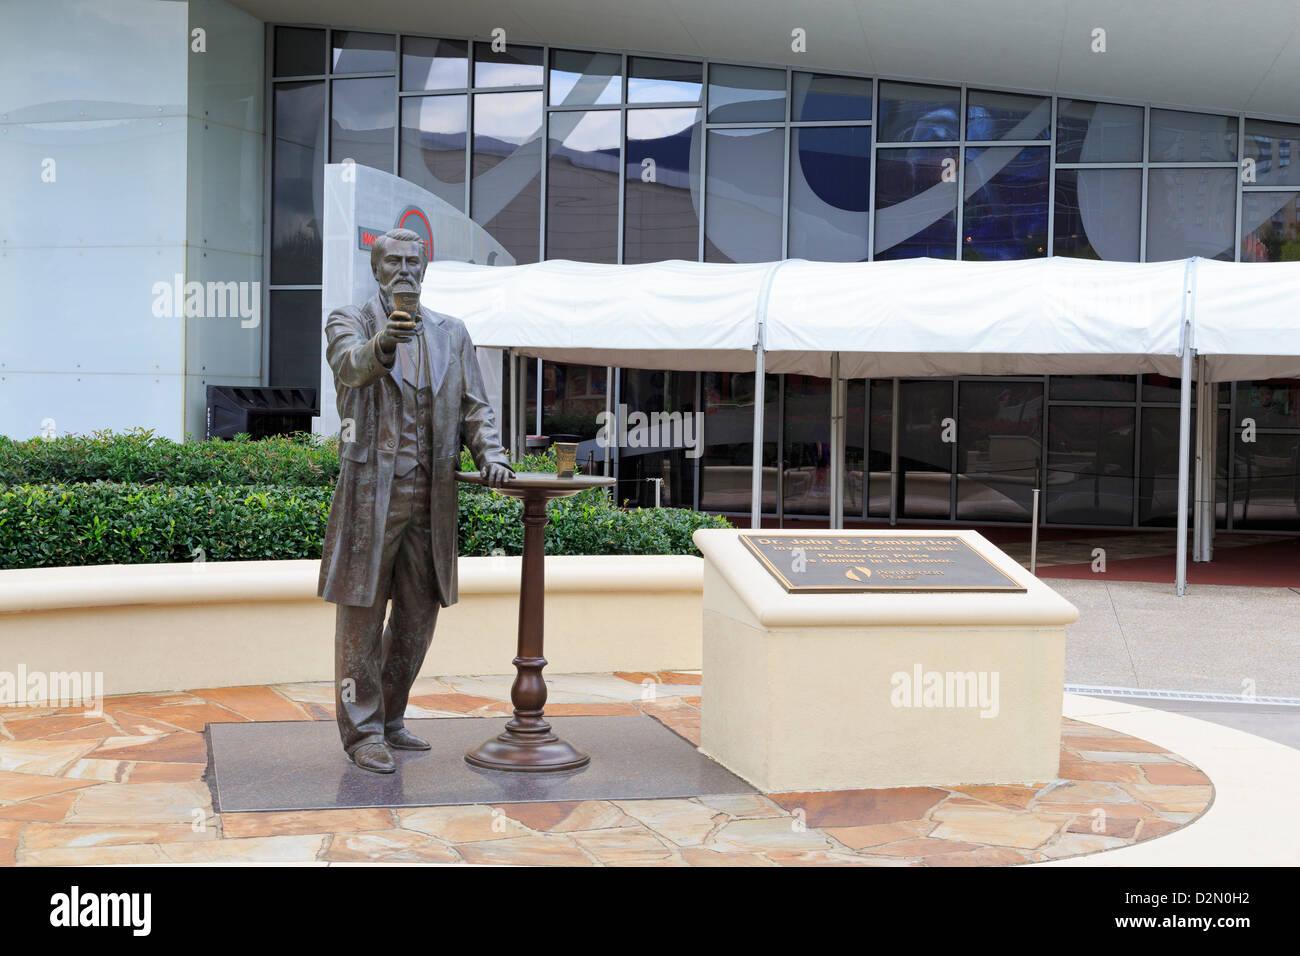 Dr. John Pemberton statue, World of Coca Cola, Pemberton Park, Atlanta, Georgia, United States of America, North - Stock Image